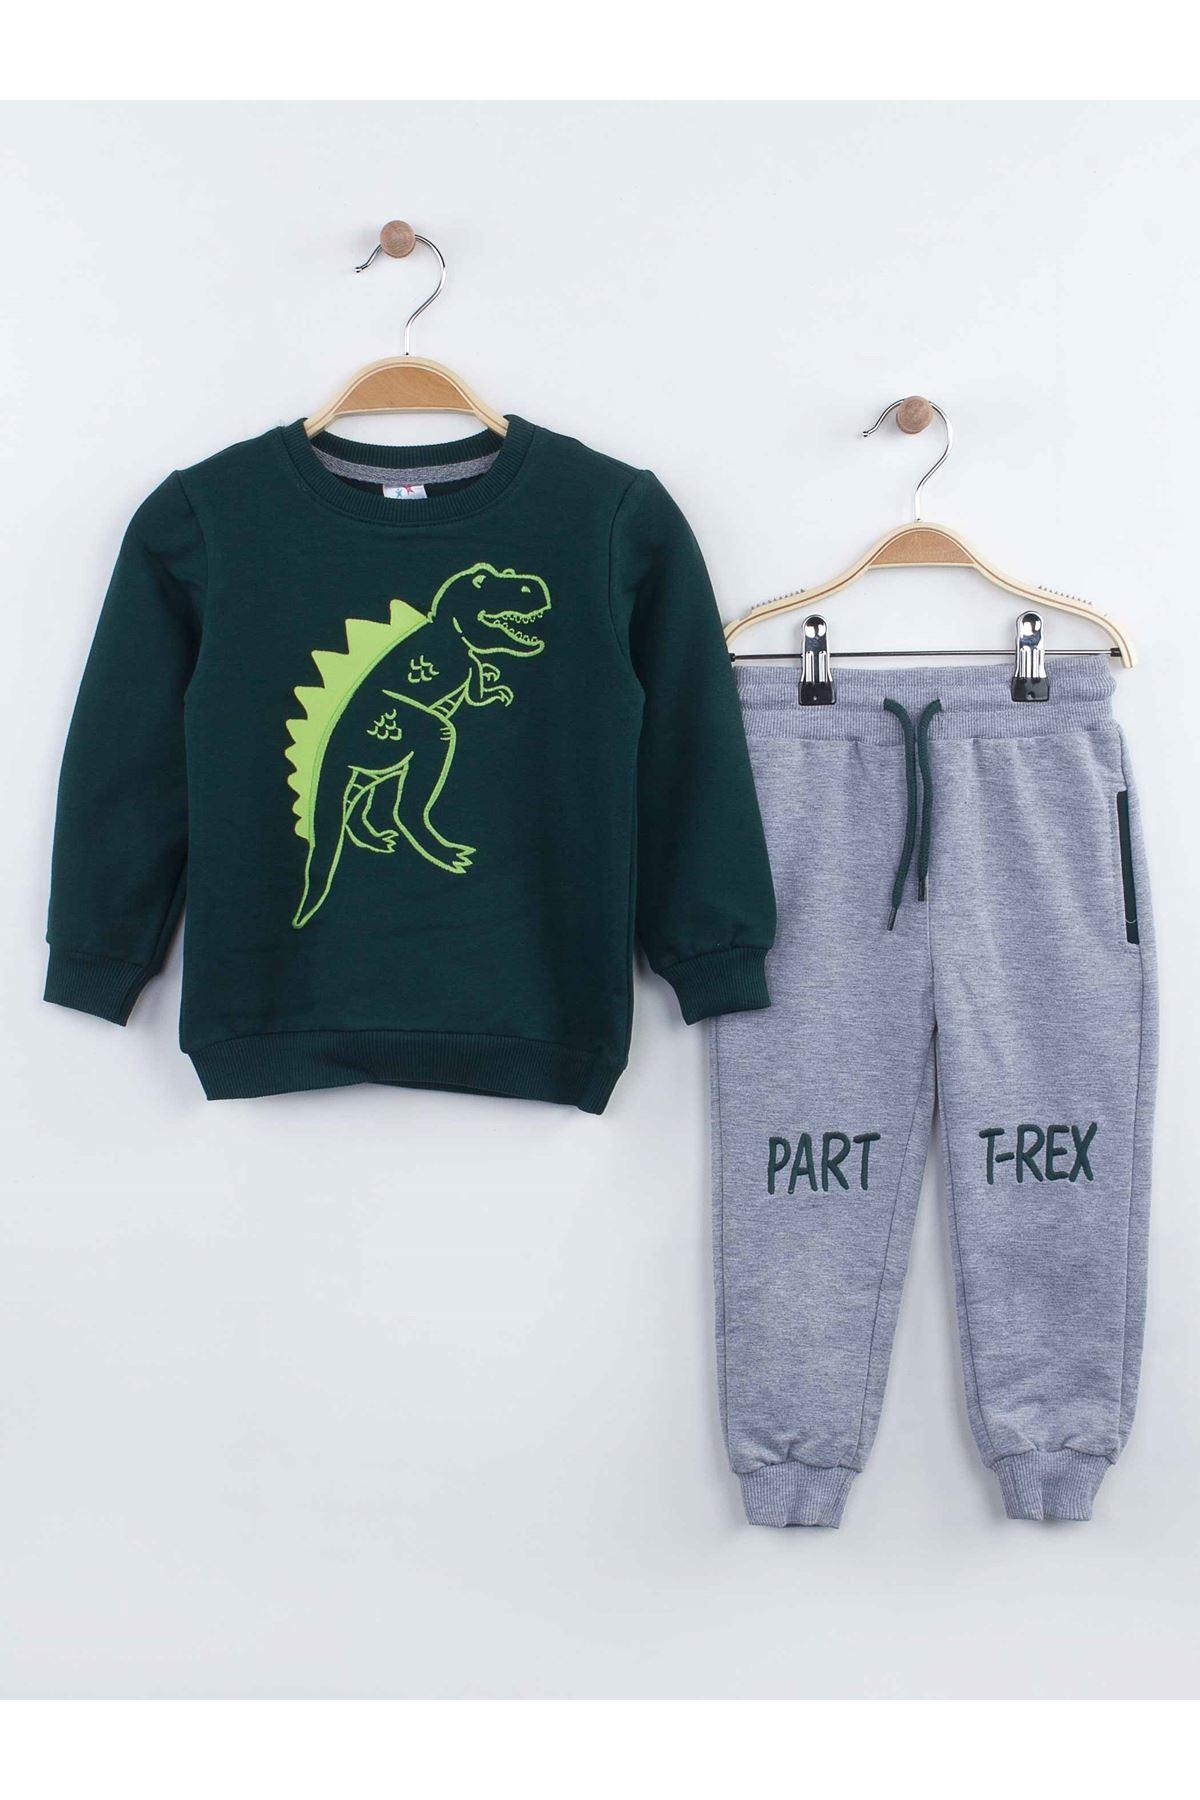 Green gray boys tracksuit set bottom sweatpants sweat top 2 piece cotton seasonal suits